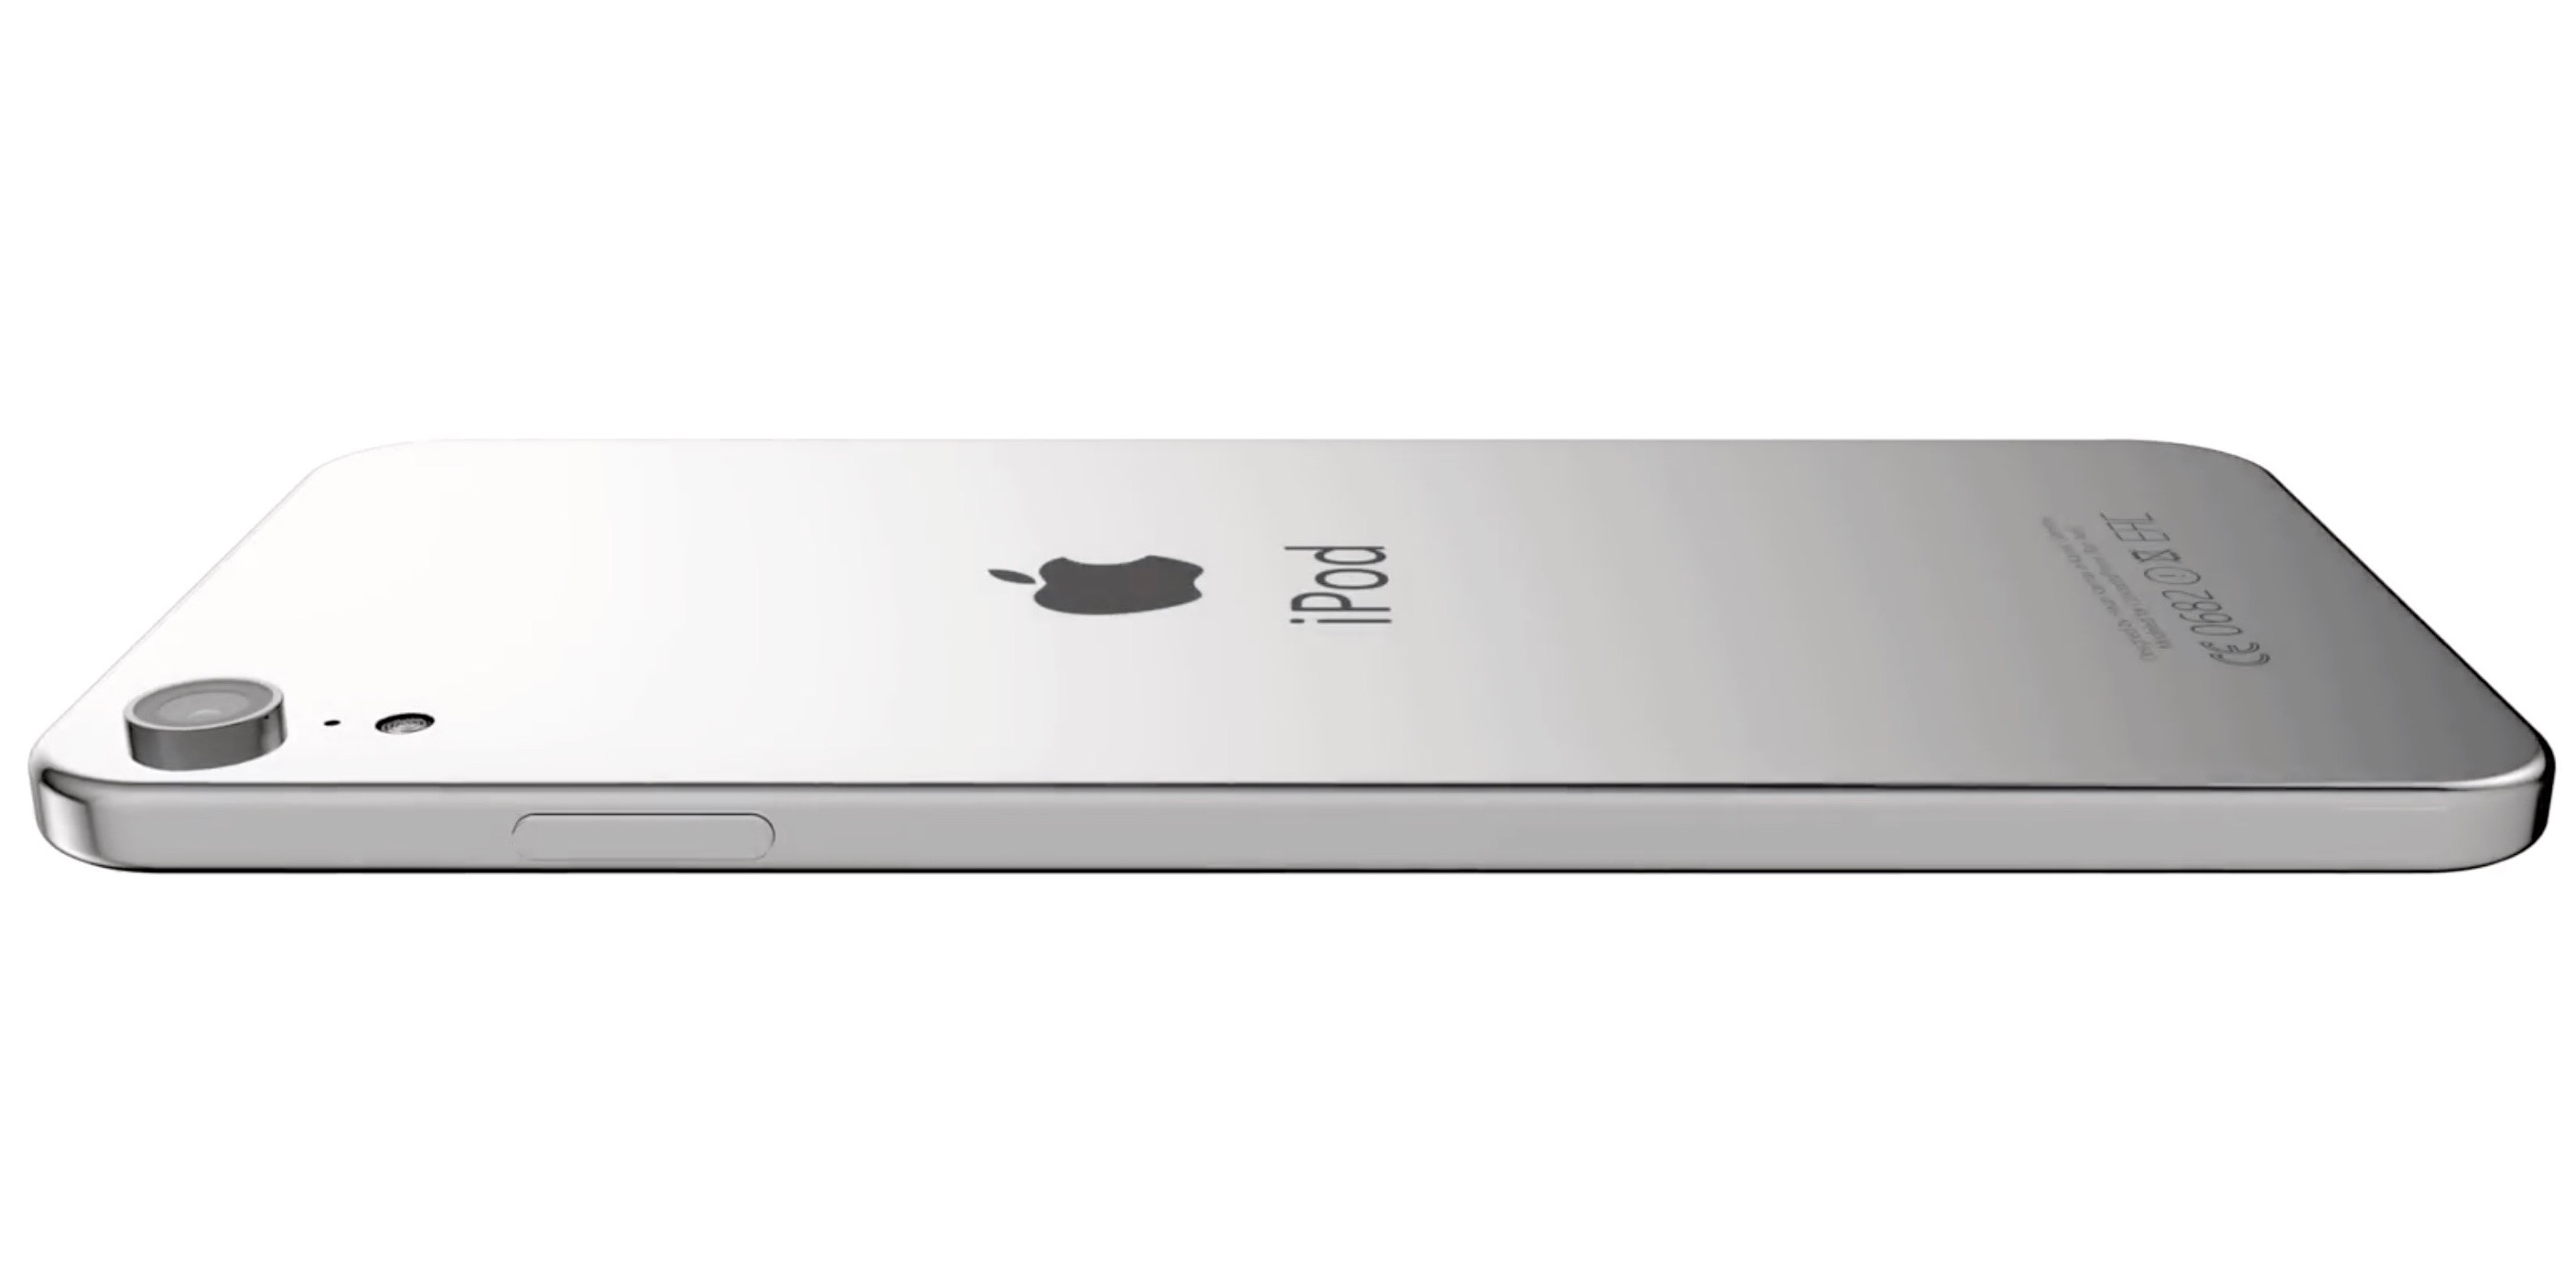 Iphone 4s siri review uk dating